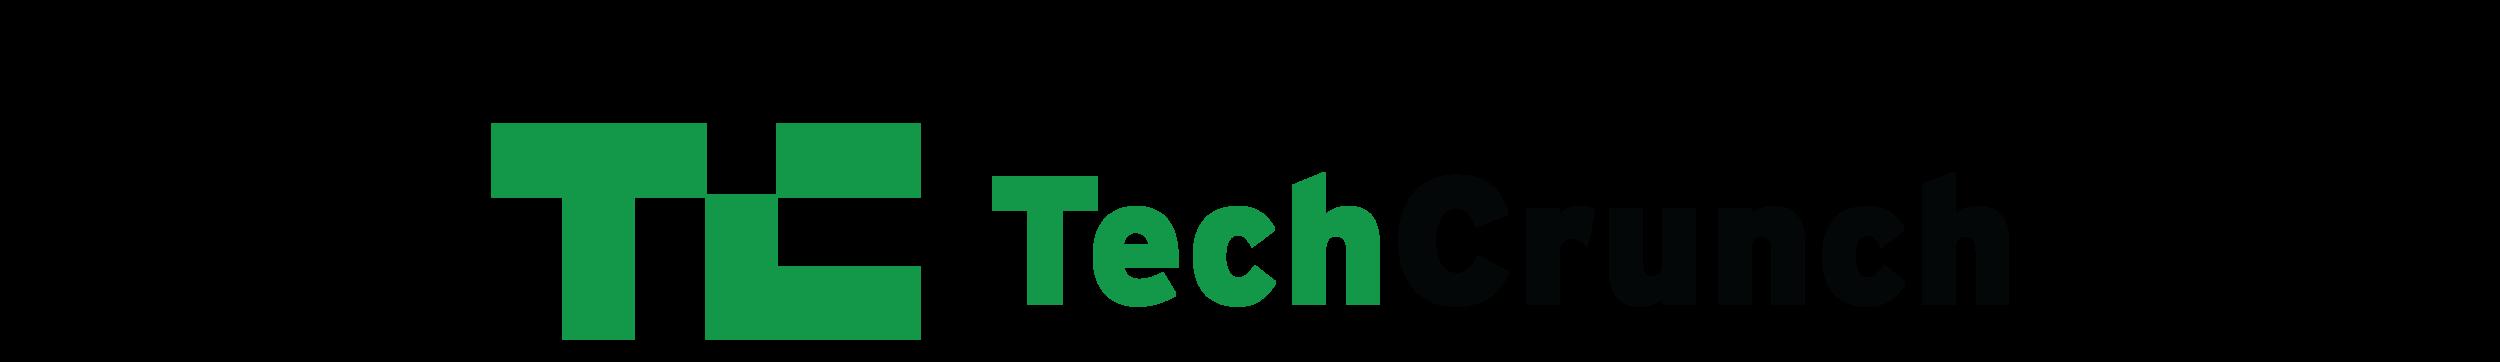 Runner-up at TechCrunch Disrupt Battlefield 2017